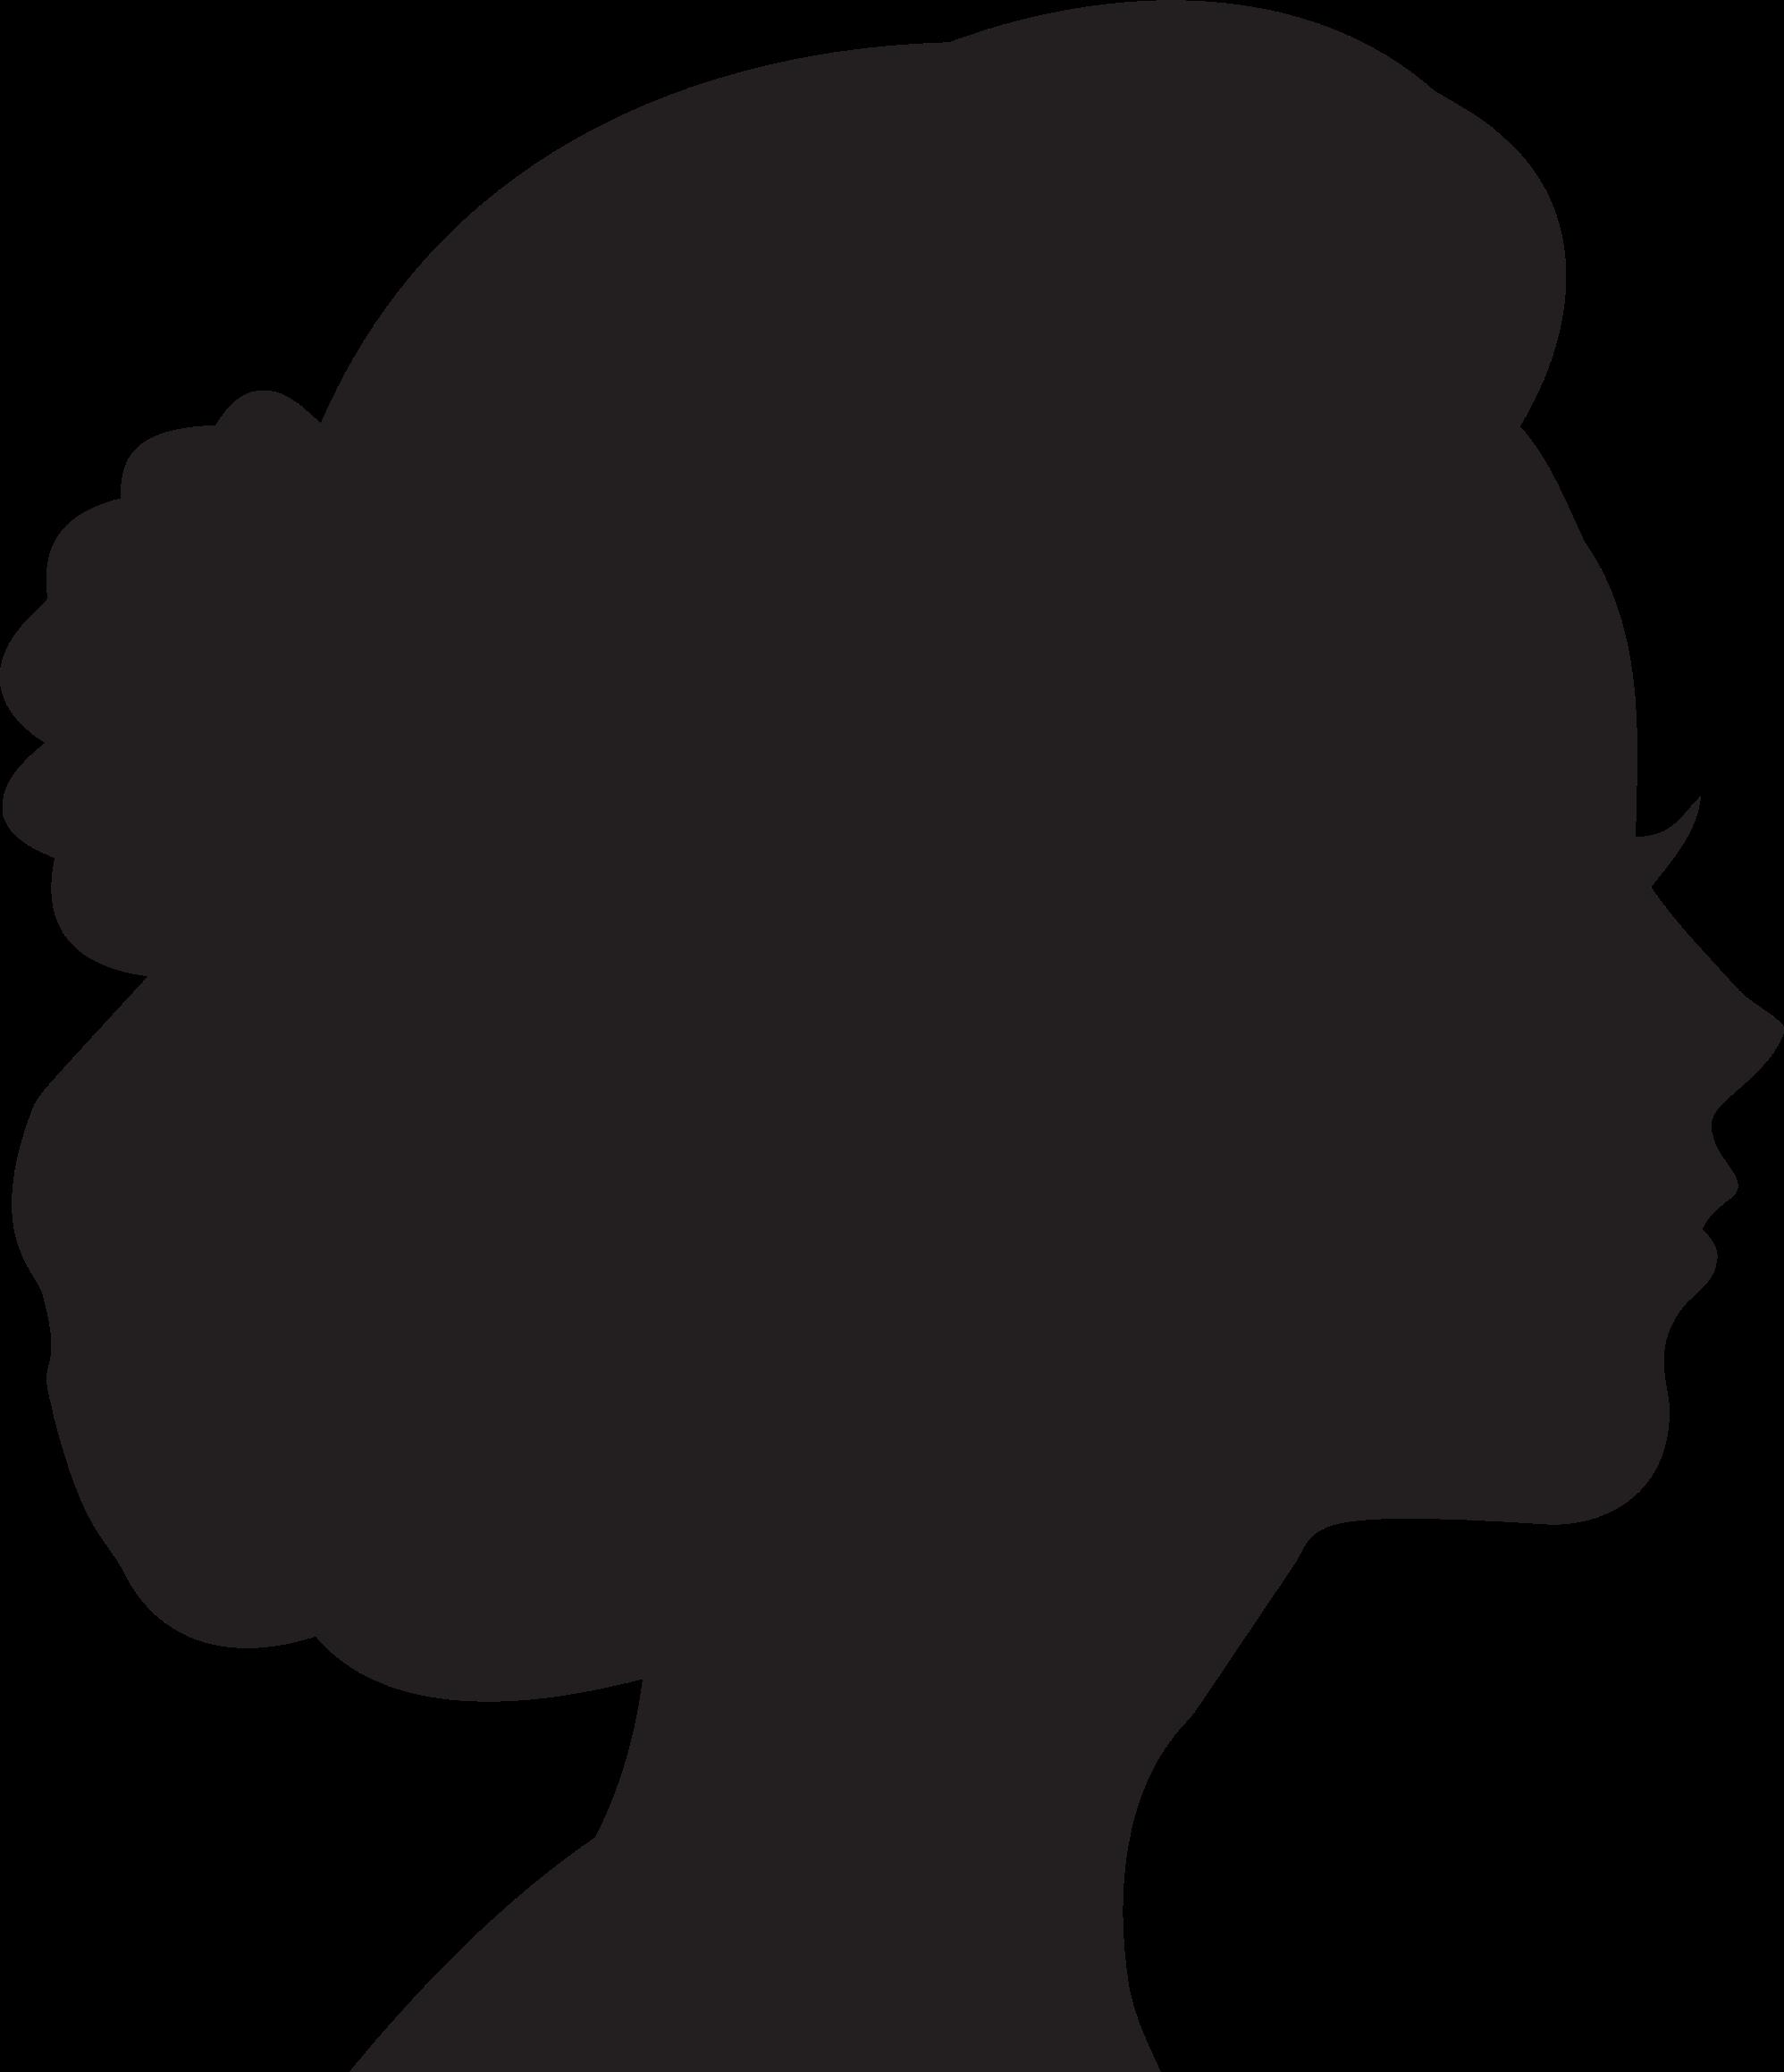 Silhouette Of Female Head.